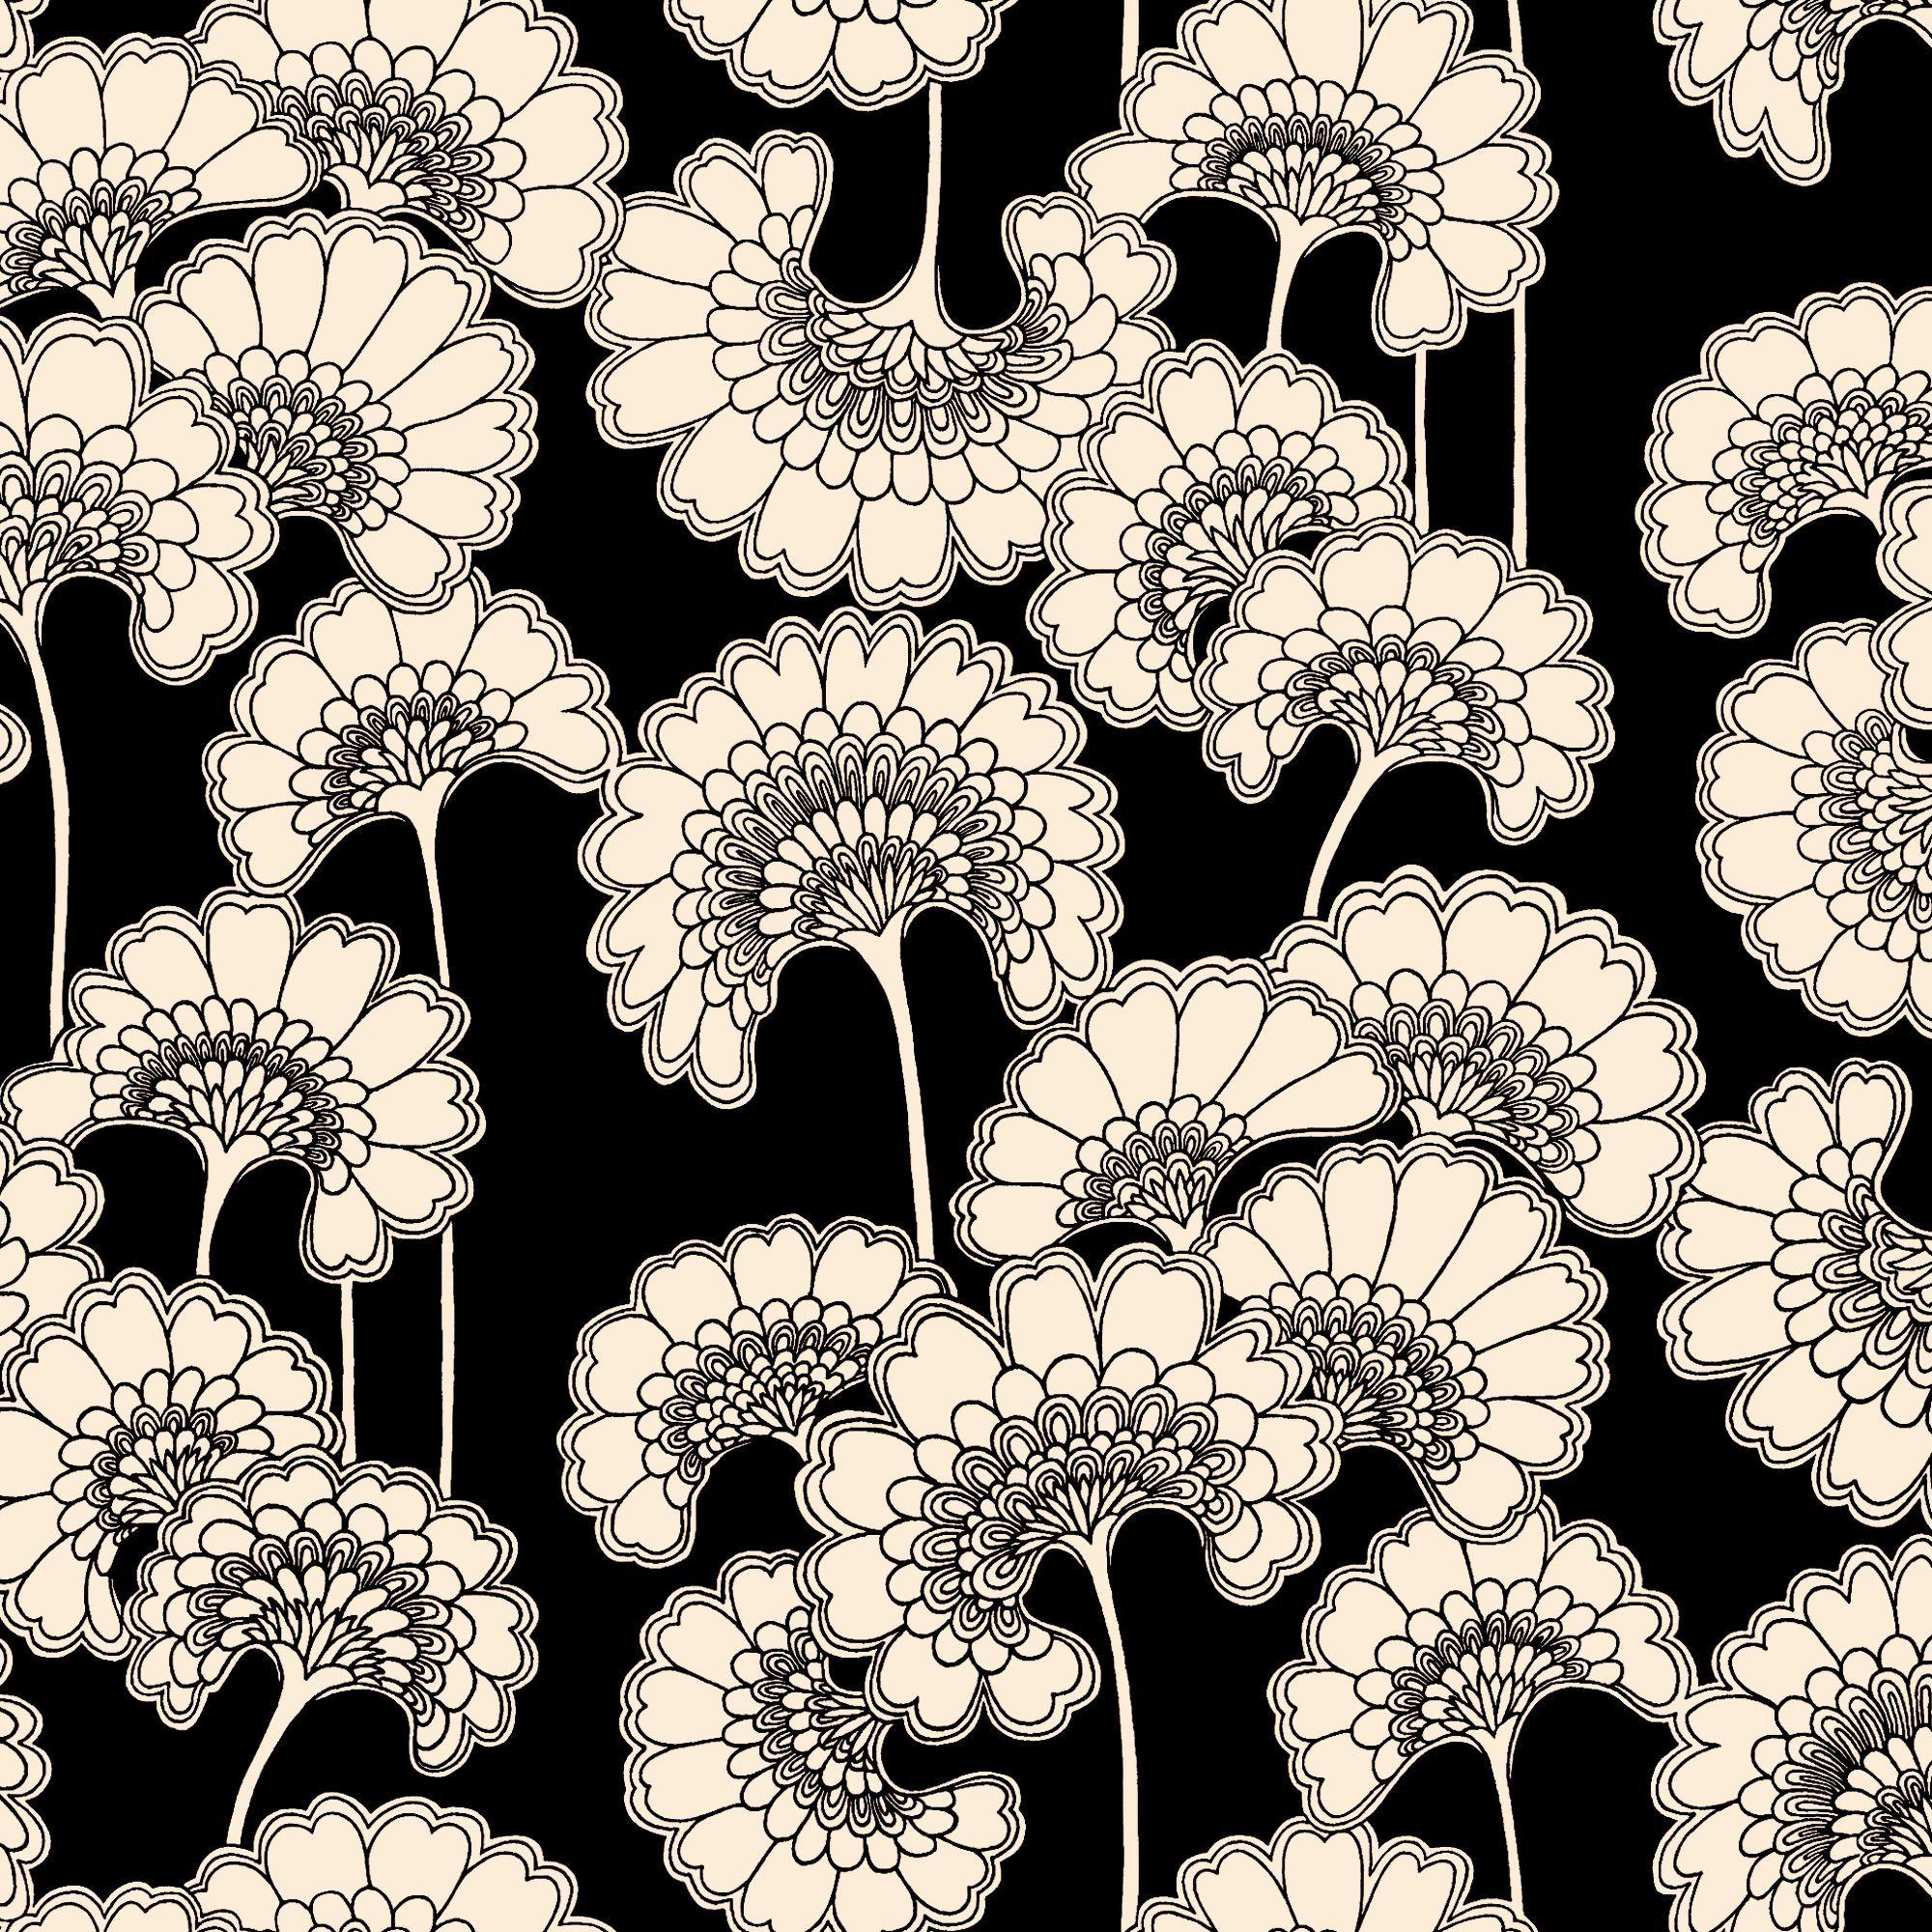 Japanese Floral Wallpaper Kate Spade Floral Wallpaper Kate